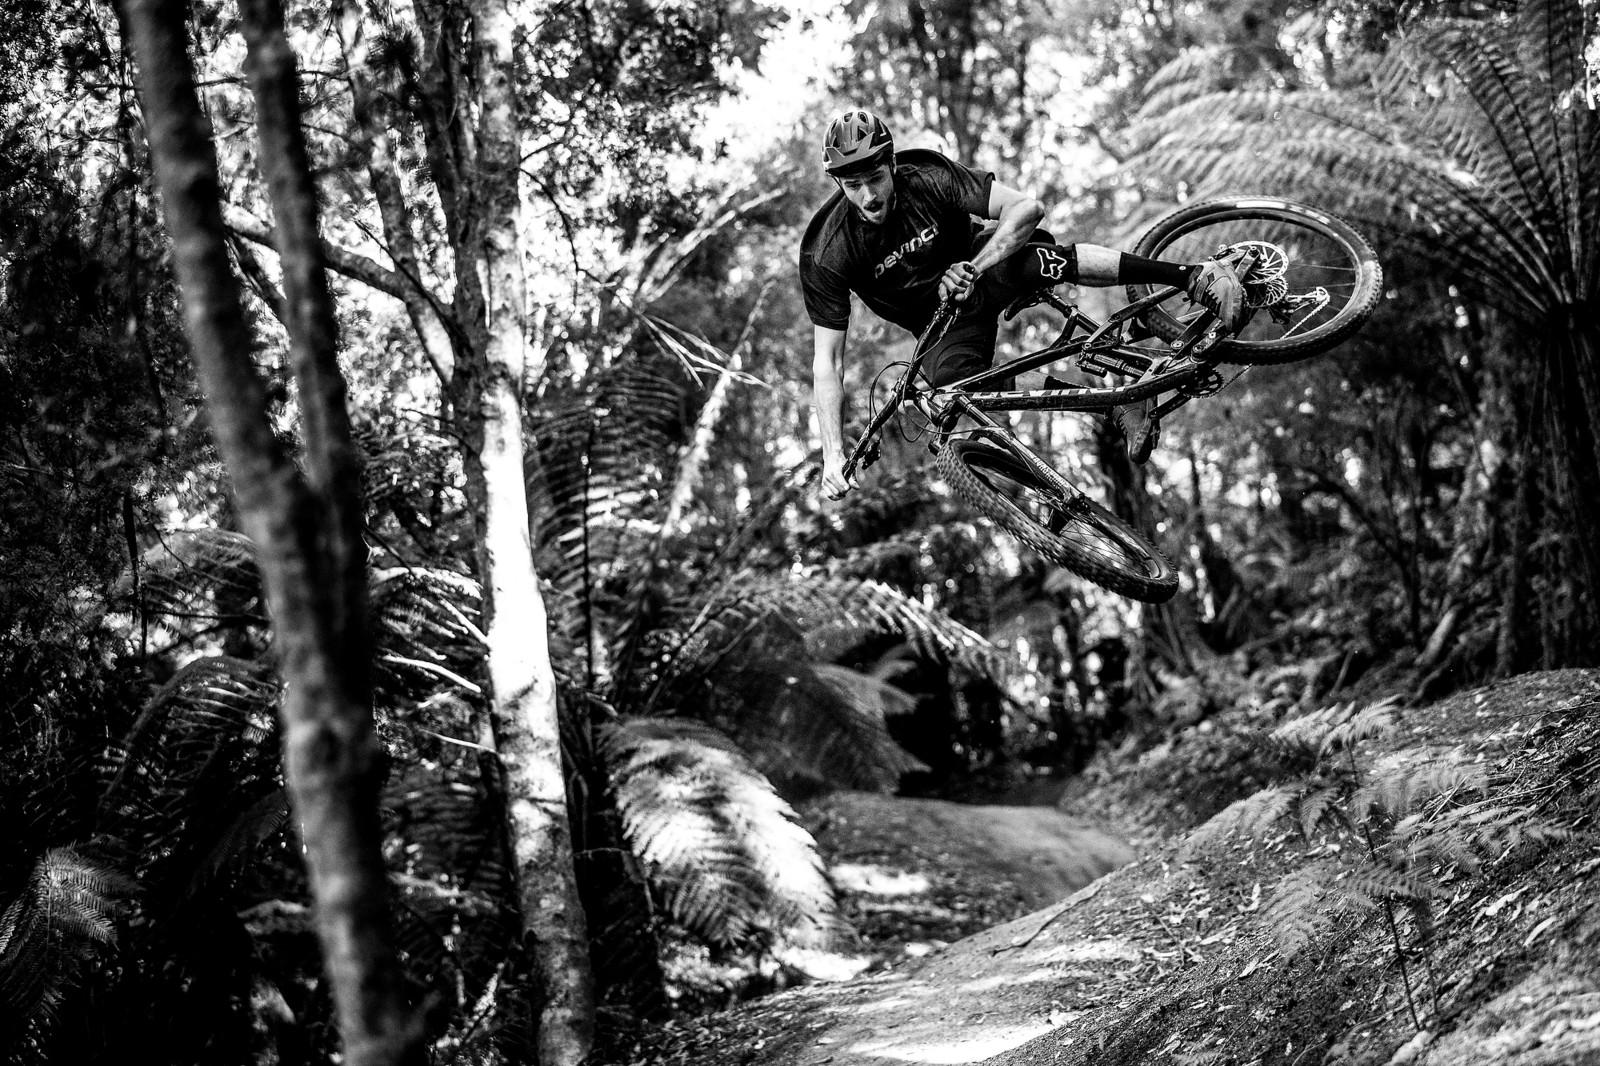 Colorless Kick - Officially Unsanctioned Enduro World Series Vertigo MTB / Moo Beer / Vital Whip-Off - Mountain Biking Pictures - Vital MTB